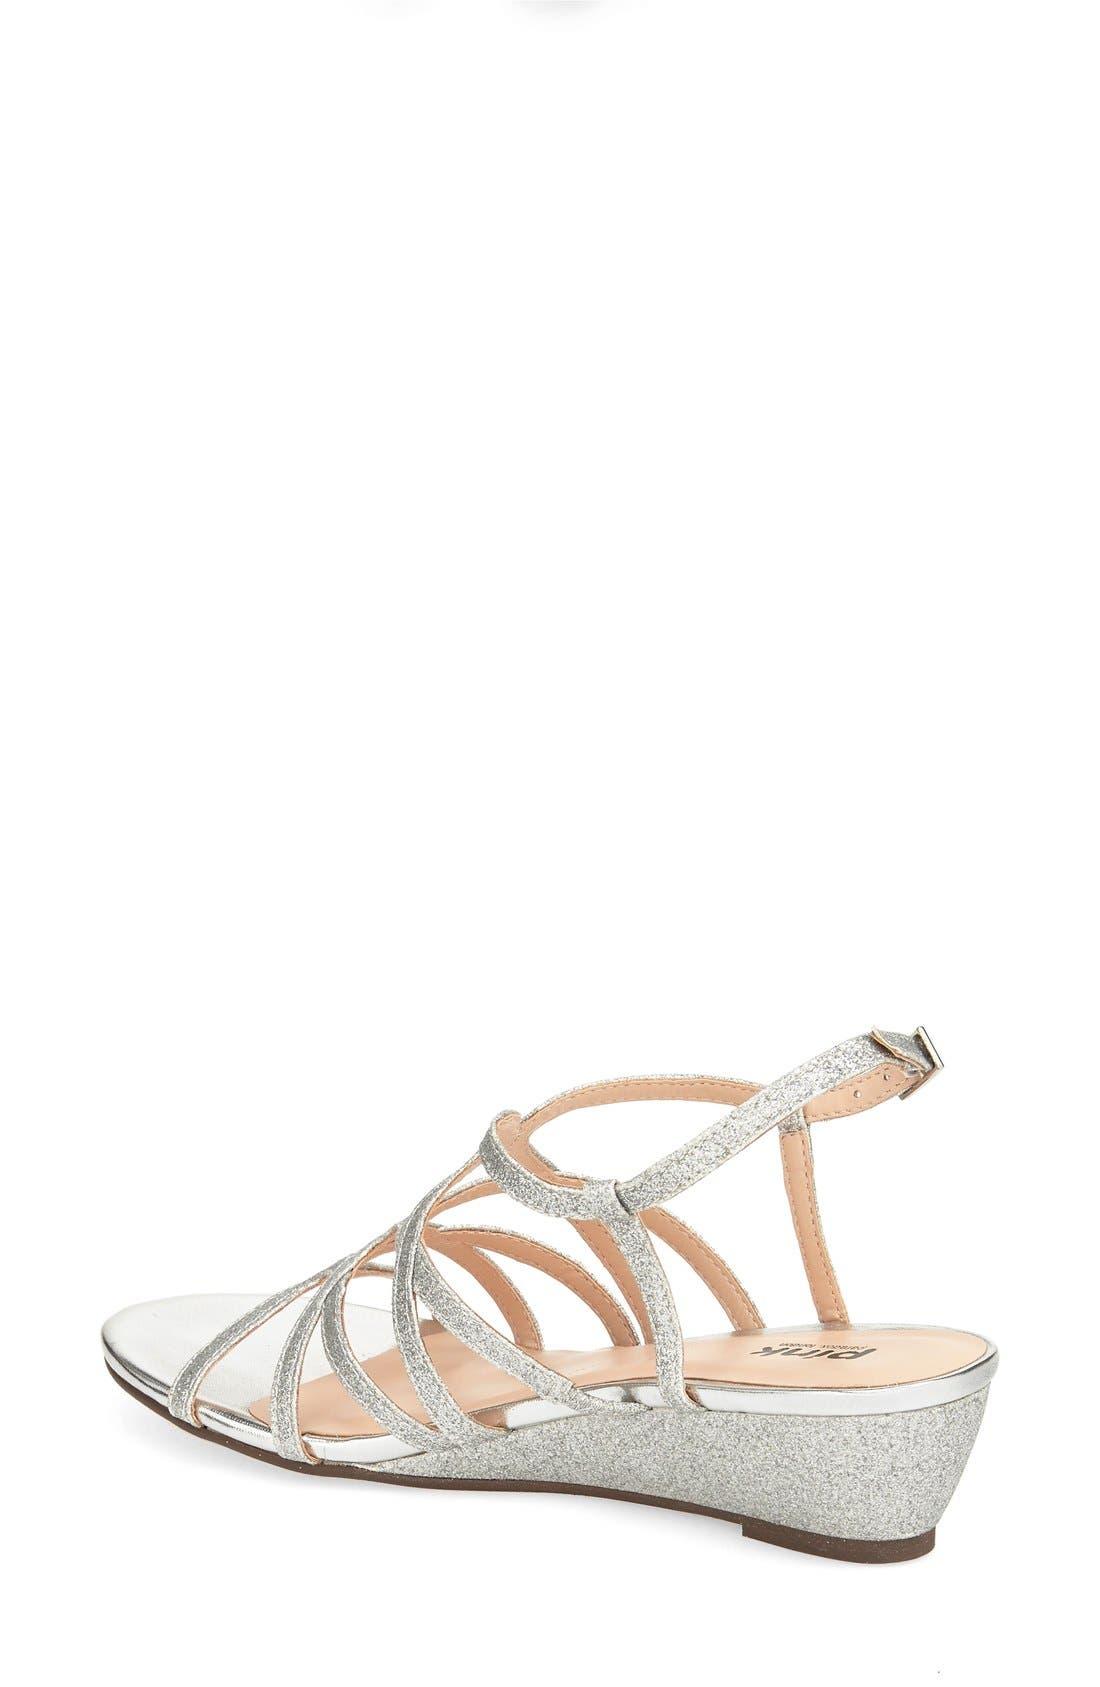 'Opulent' Wedge Sandal,                             Alternate thumbnail 2, color,                             040